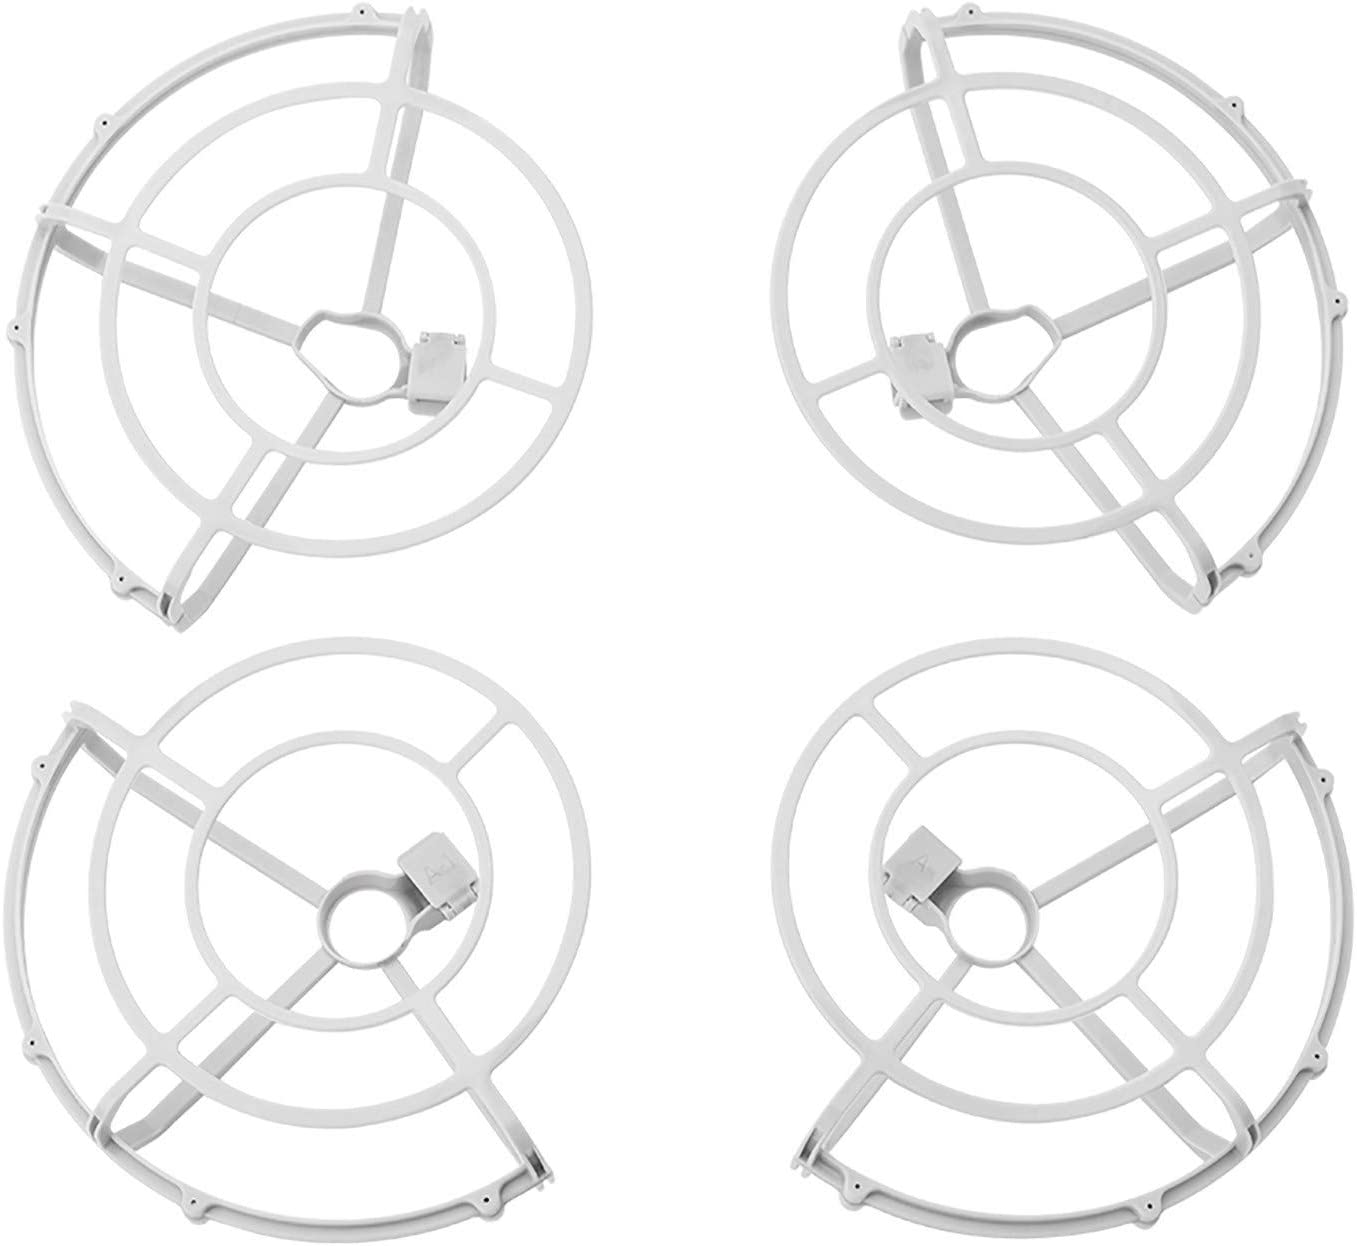 Silikon Propeller Schutzhalter Schutz Propellerblatt Stabilisator Schutzband f/ür Mavic Mini Propeller 2 Pcs 2 * Schwarz sciuU Propeller Fixateur Kompatibel mit DJI Mavic Mini Drone Props,